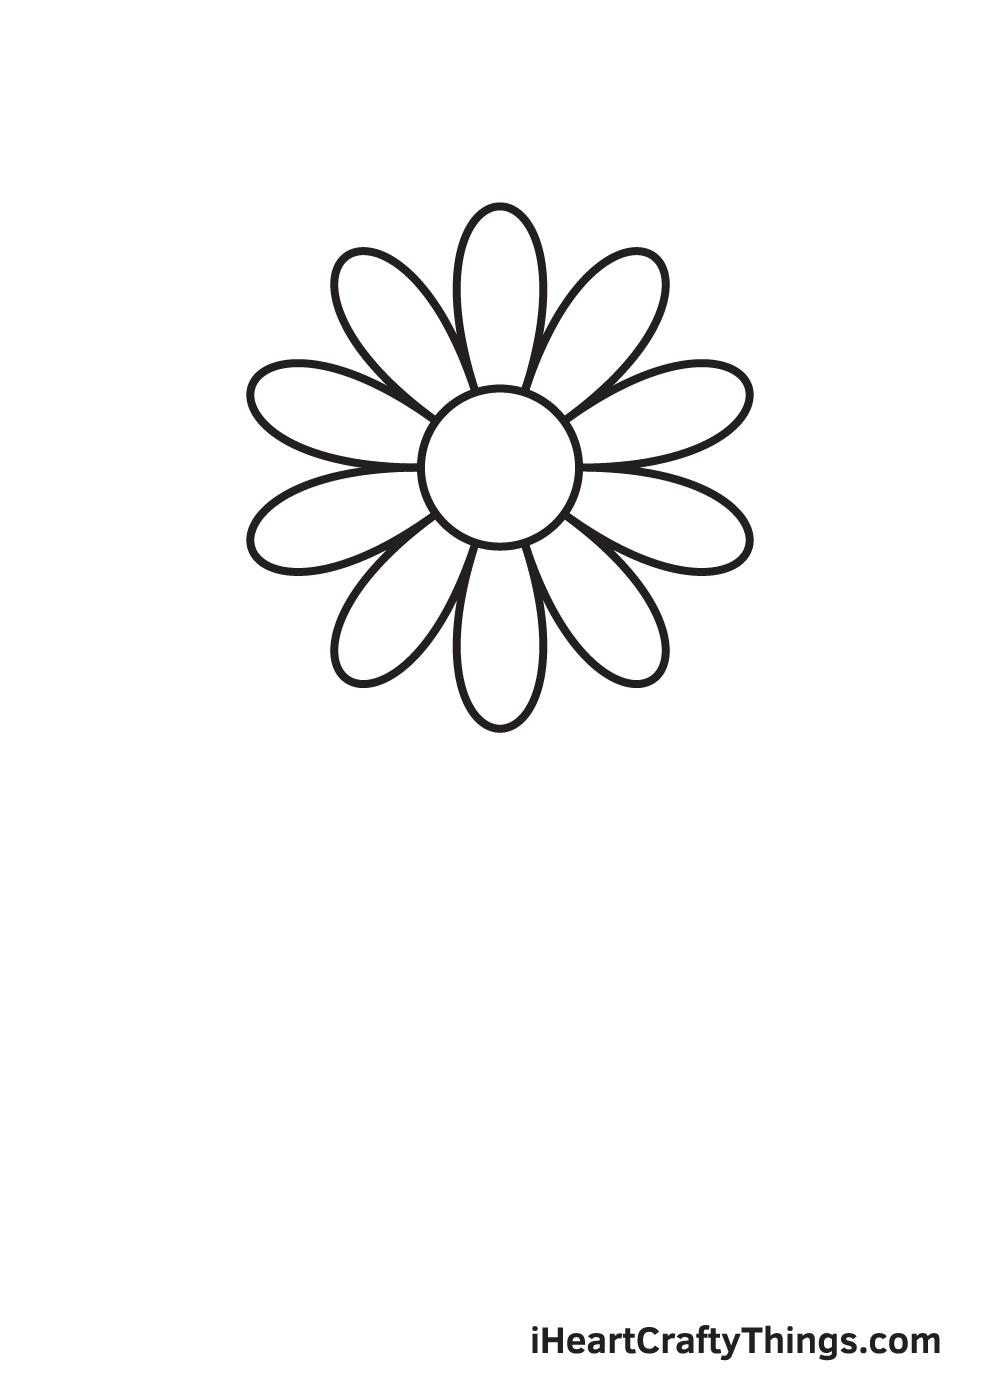 daisy drawing - step 4